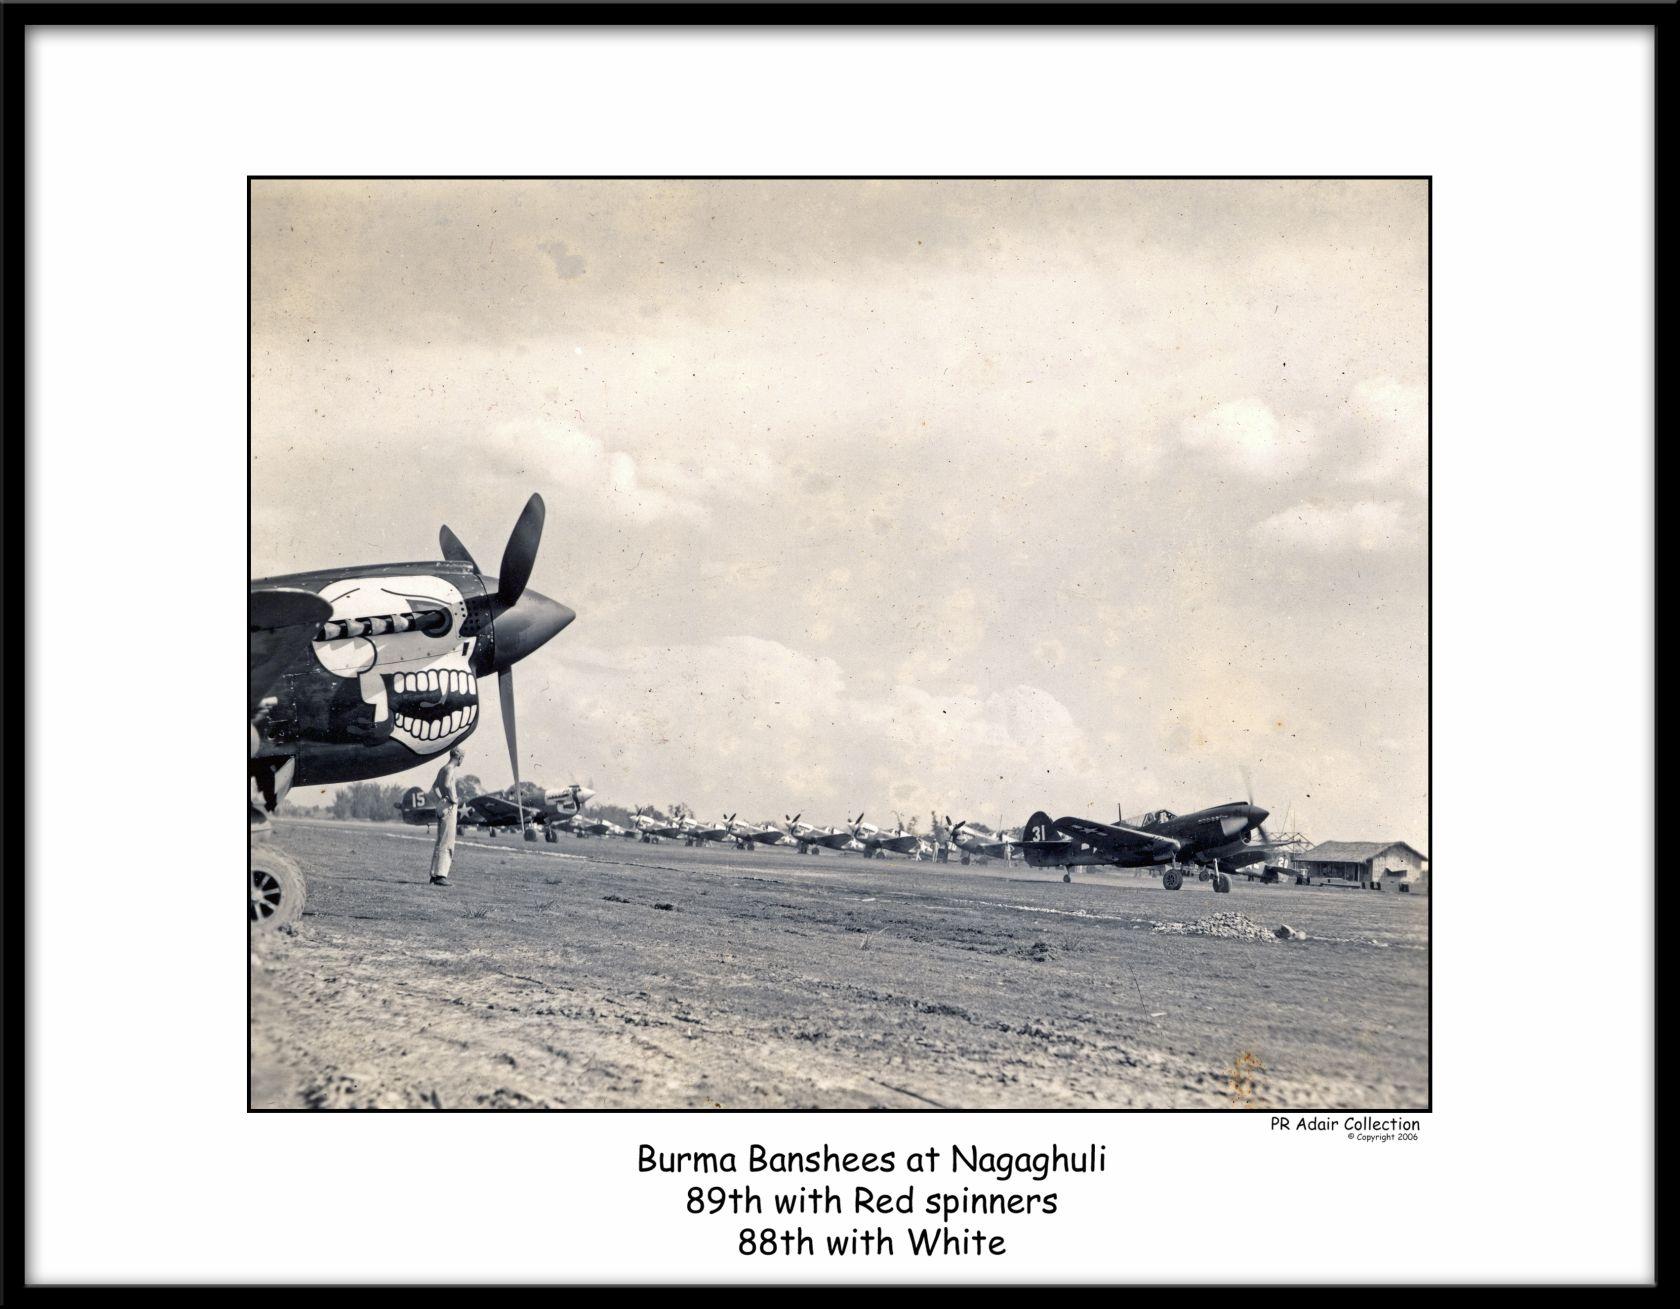 Burma Banshee 139